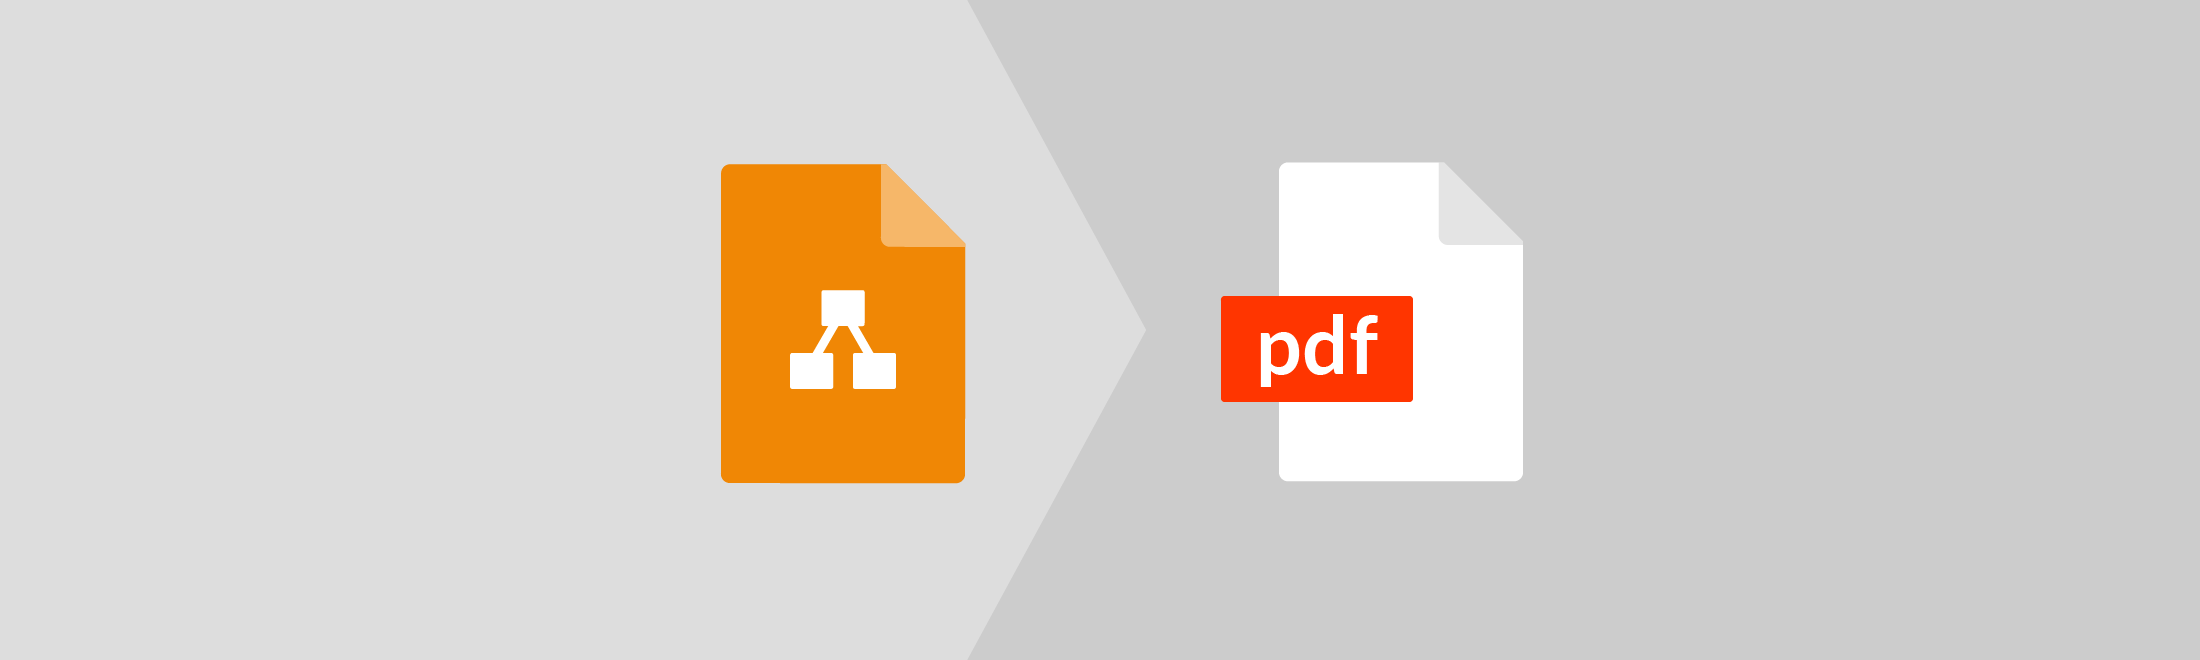 Export your draw.io diagrams as a PDF.